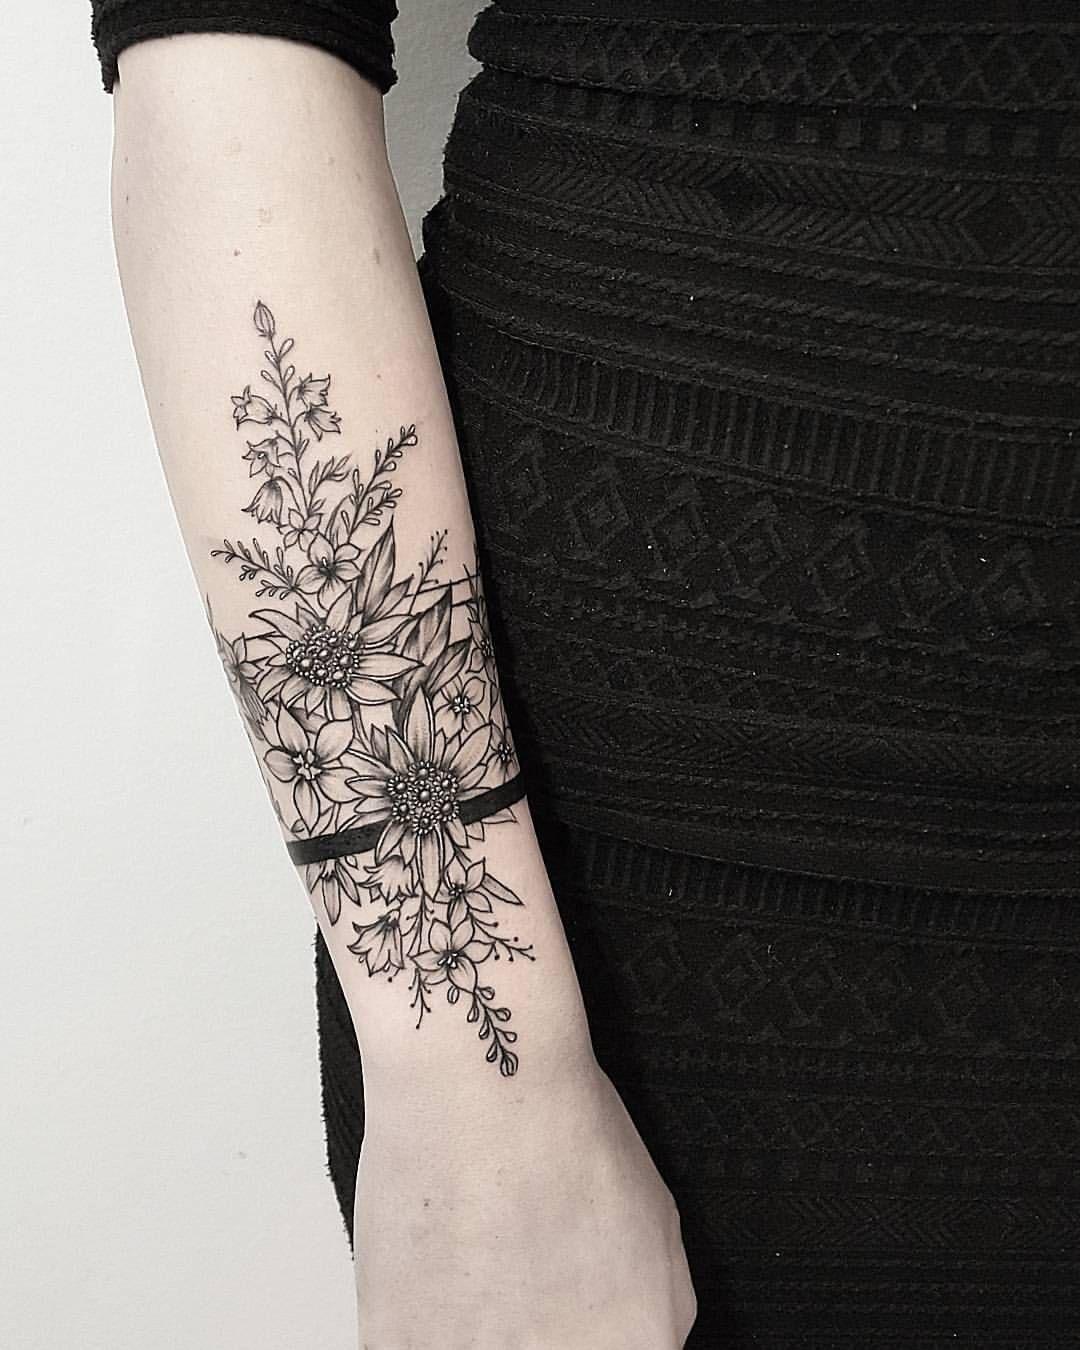 Alpine flowers děkuju moc za statečnost tattoo ideas and designs